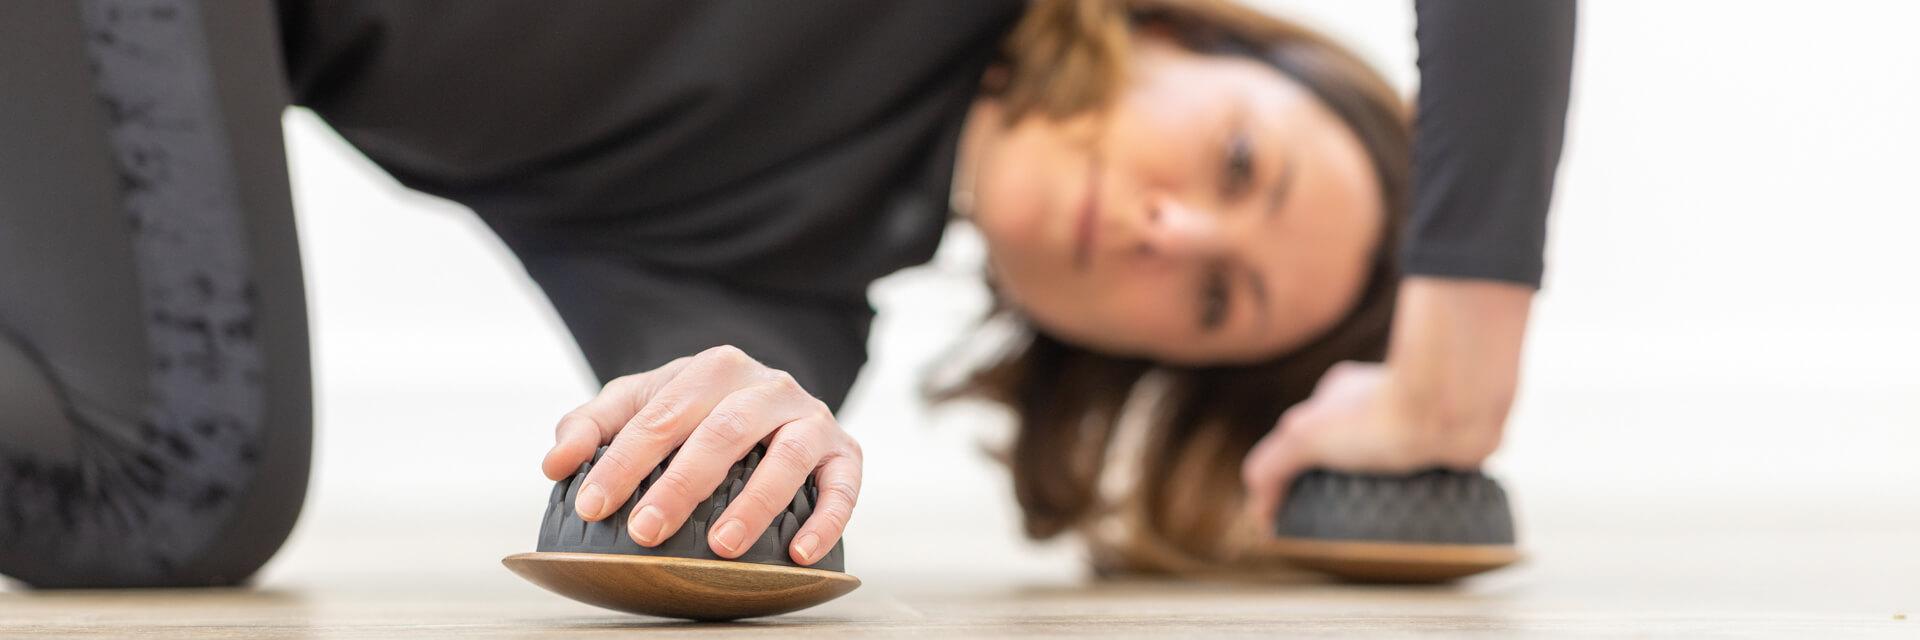 Inna-Gulak-inna-Gulak-Pilates-Pilates-venlo-Pilates-groepslessen-Personal-Training-Pilates-Reformer-01